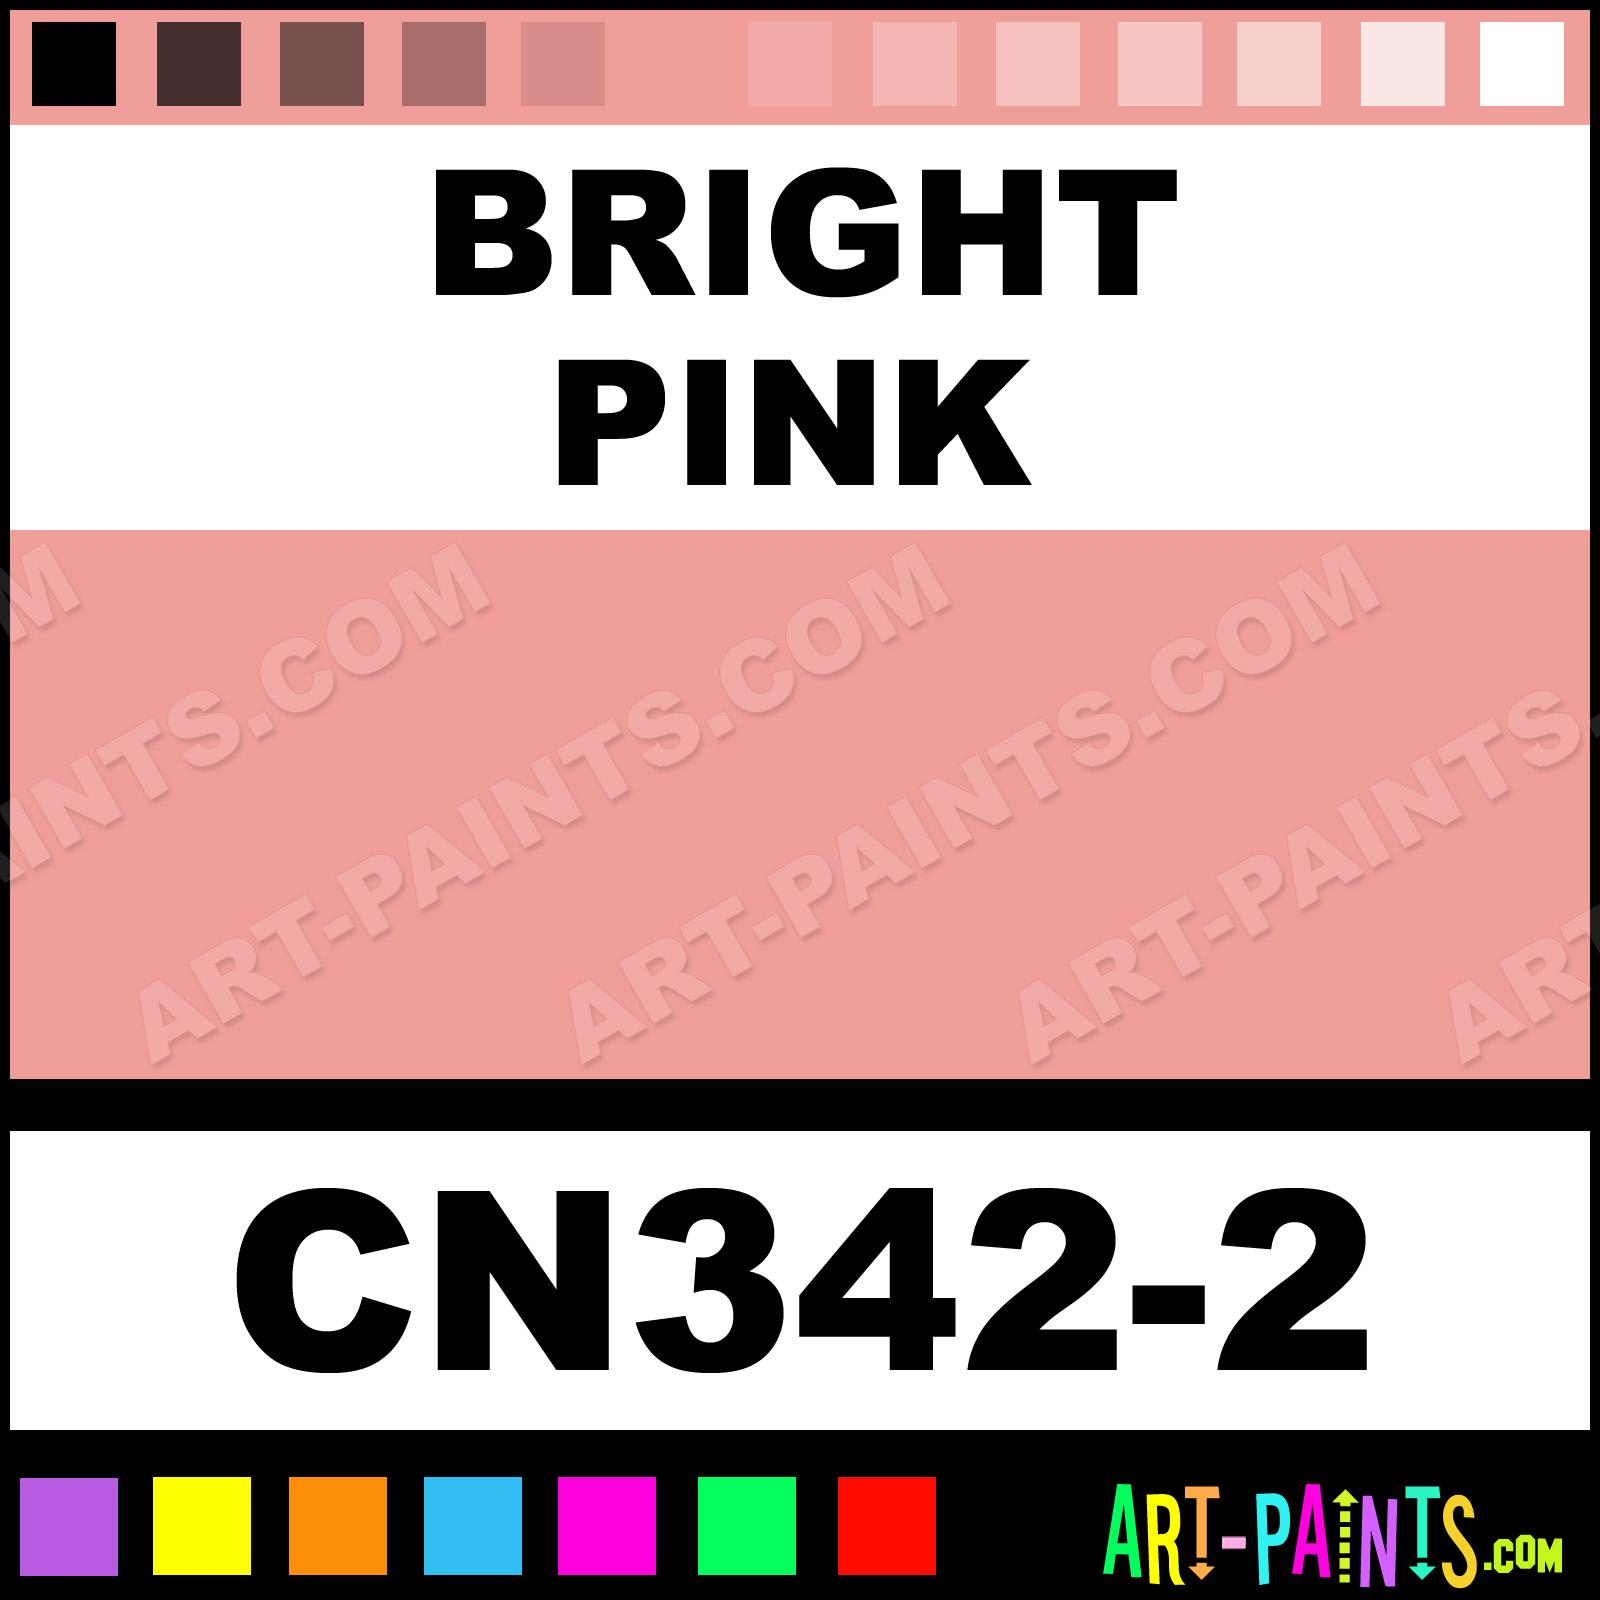 Bright Pink Paint Samples Kitchen Towels: Bright Pink Concepts Underglaze Ceramic Paints